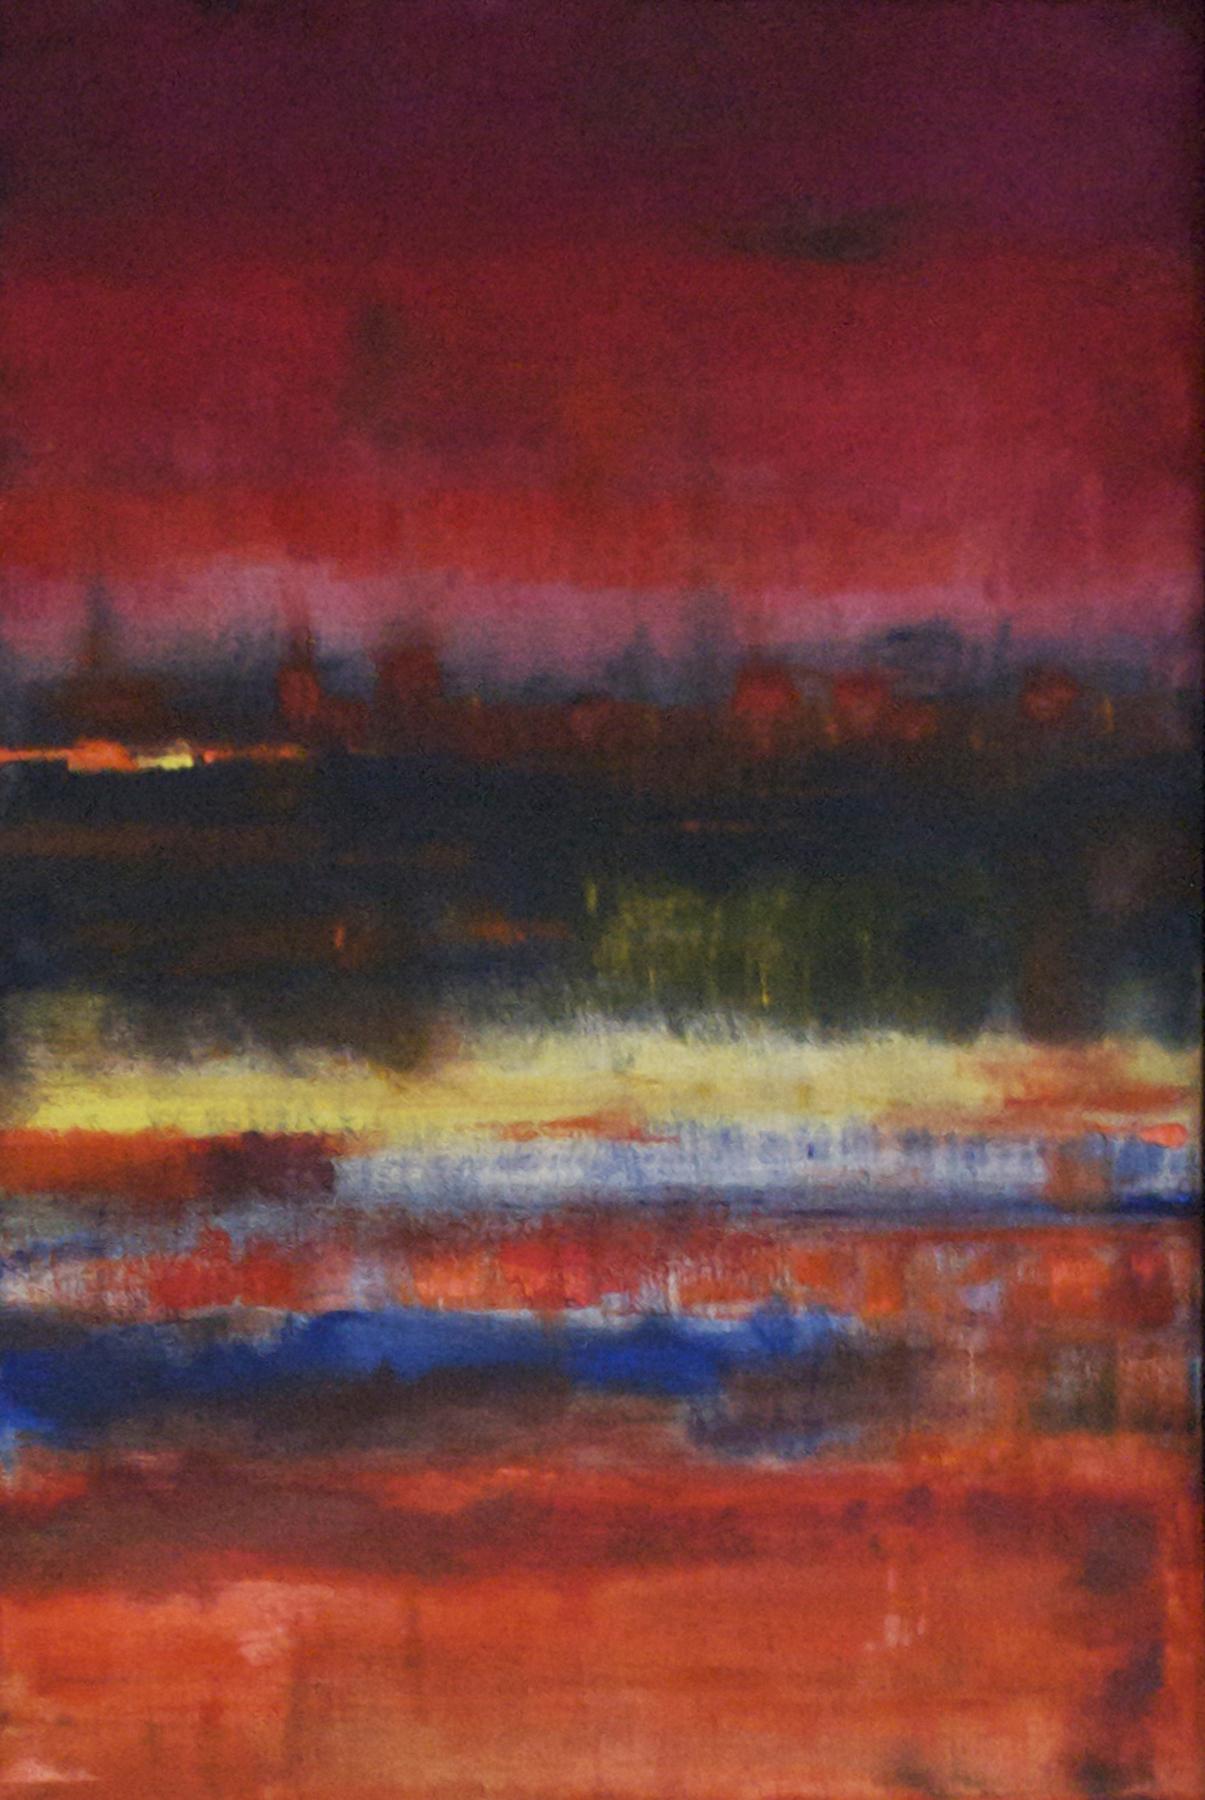 "Landscape at Dusk  2013 25.50"" x 18.50"" Oil on Canvas"